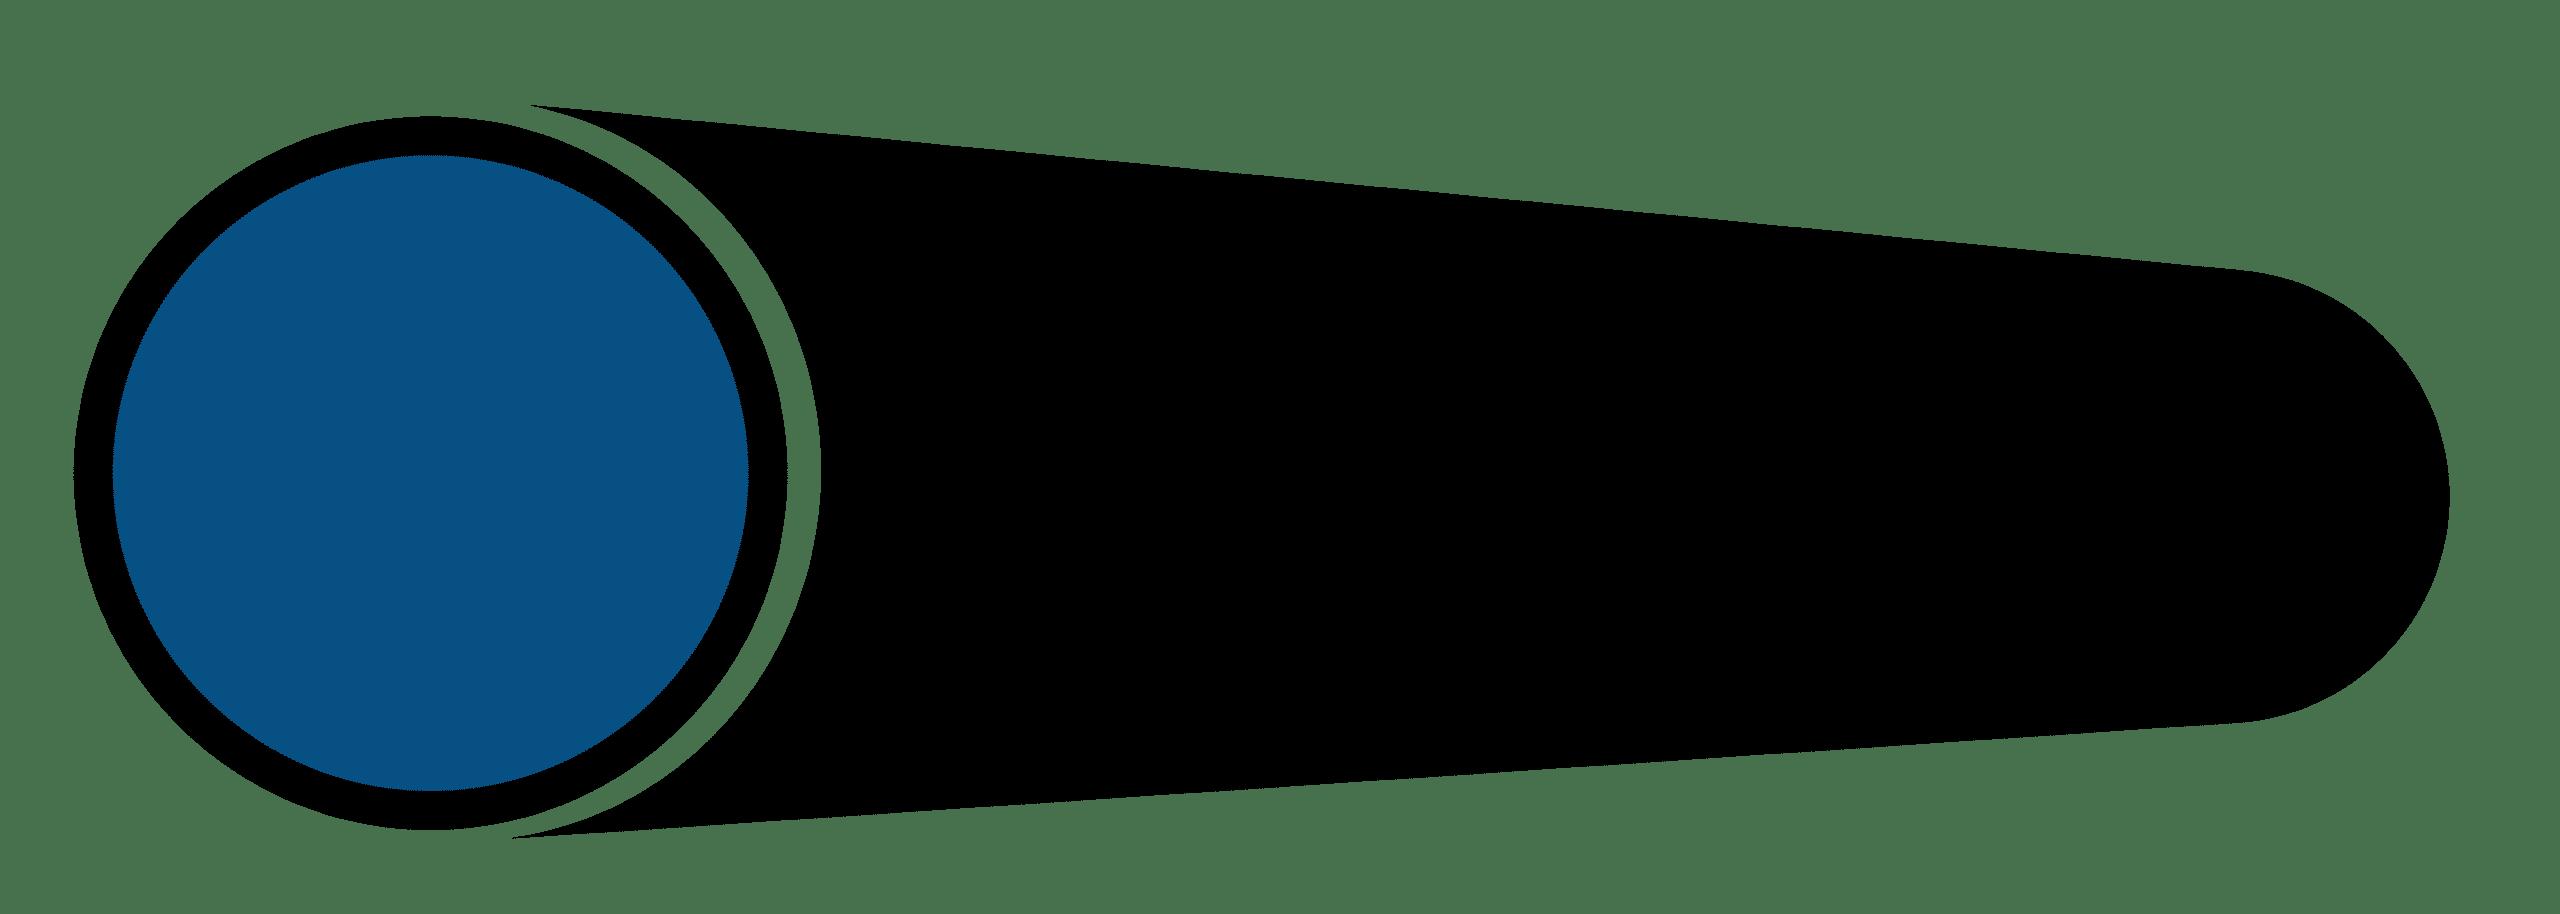 Icon ข้อดีรั้วตาข่ายถักปม เส้นลวดบนล่างเคลือบสีดำพิเศษ